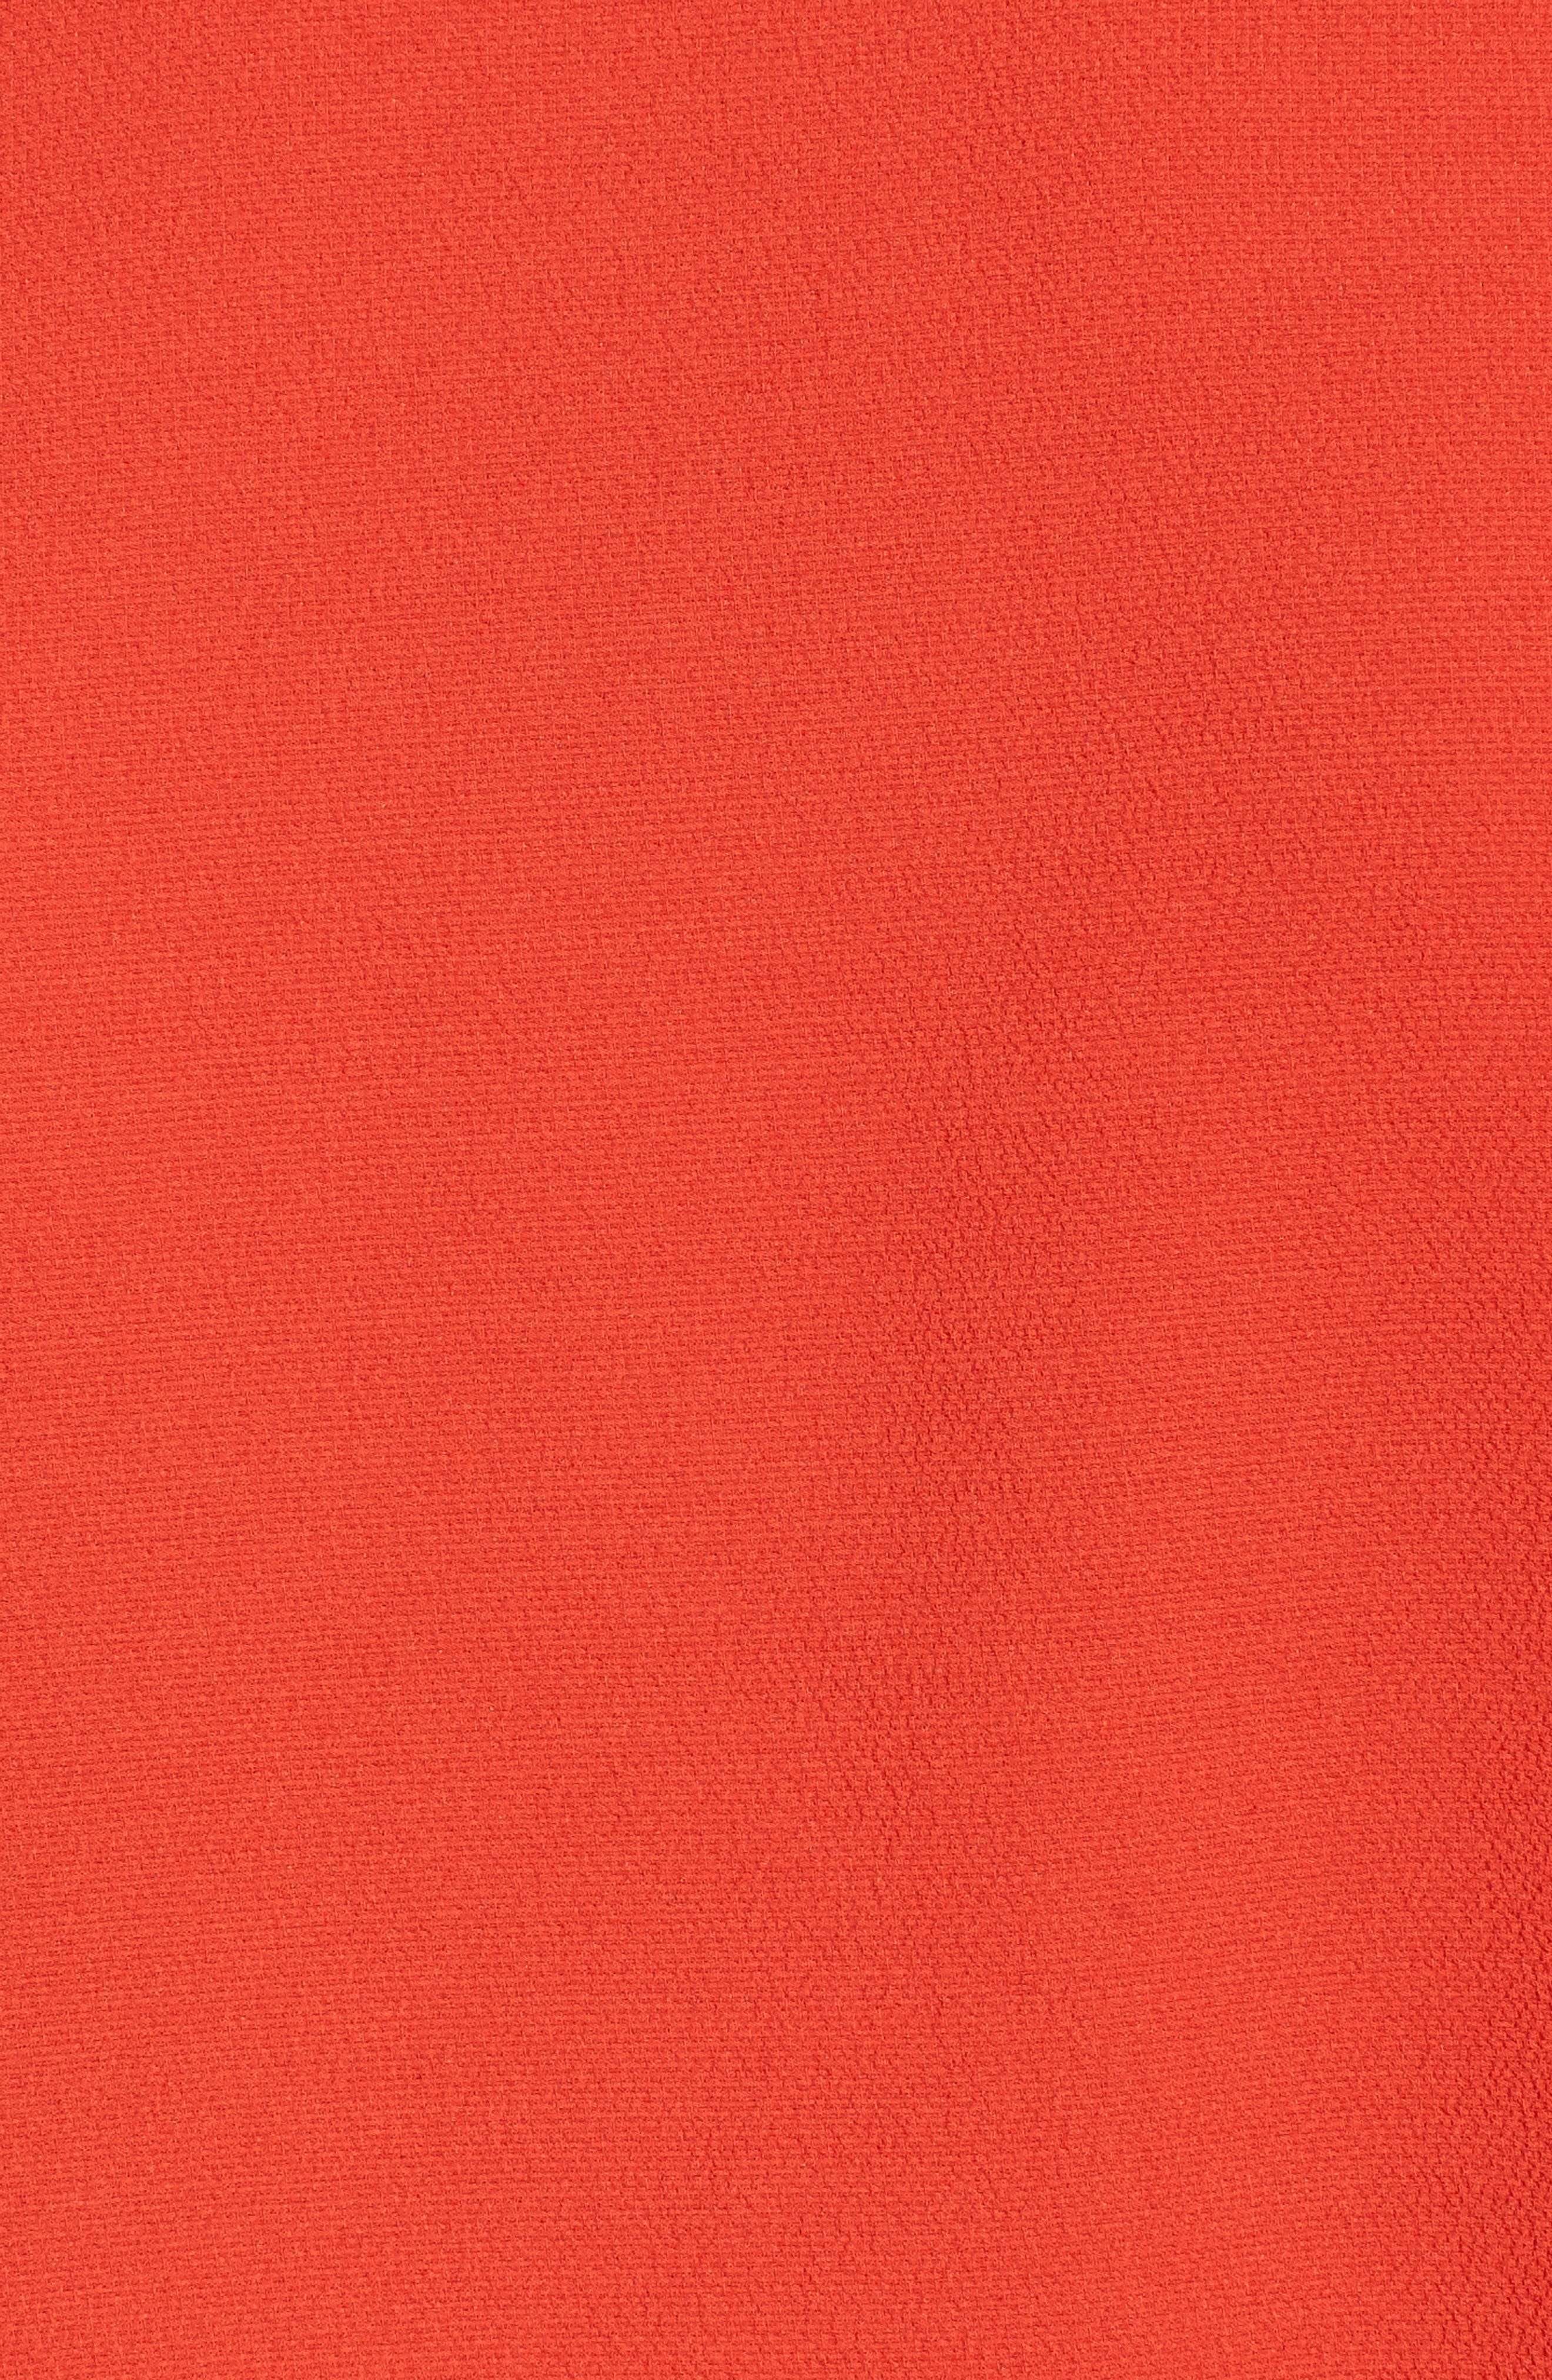 Alternate Image 5  - Gibson Ruffle Sleeve Top (Regular & Petite)